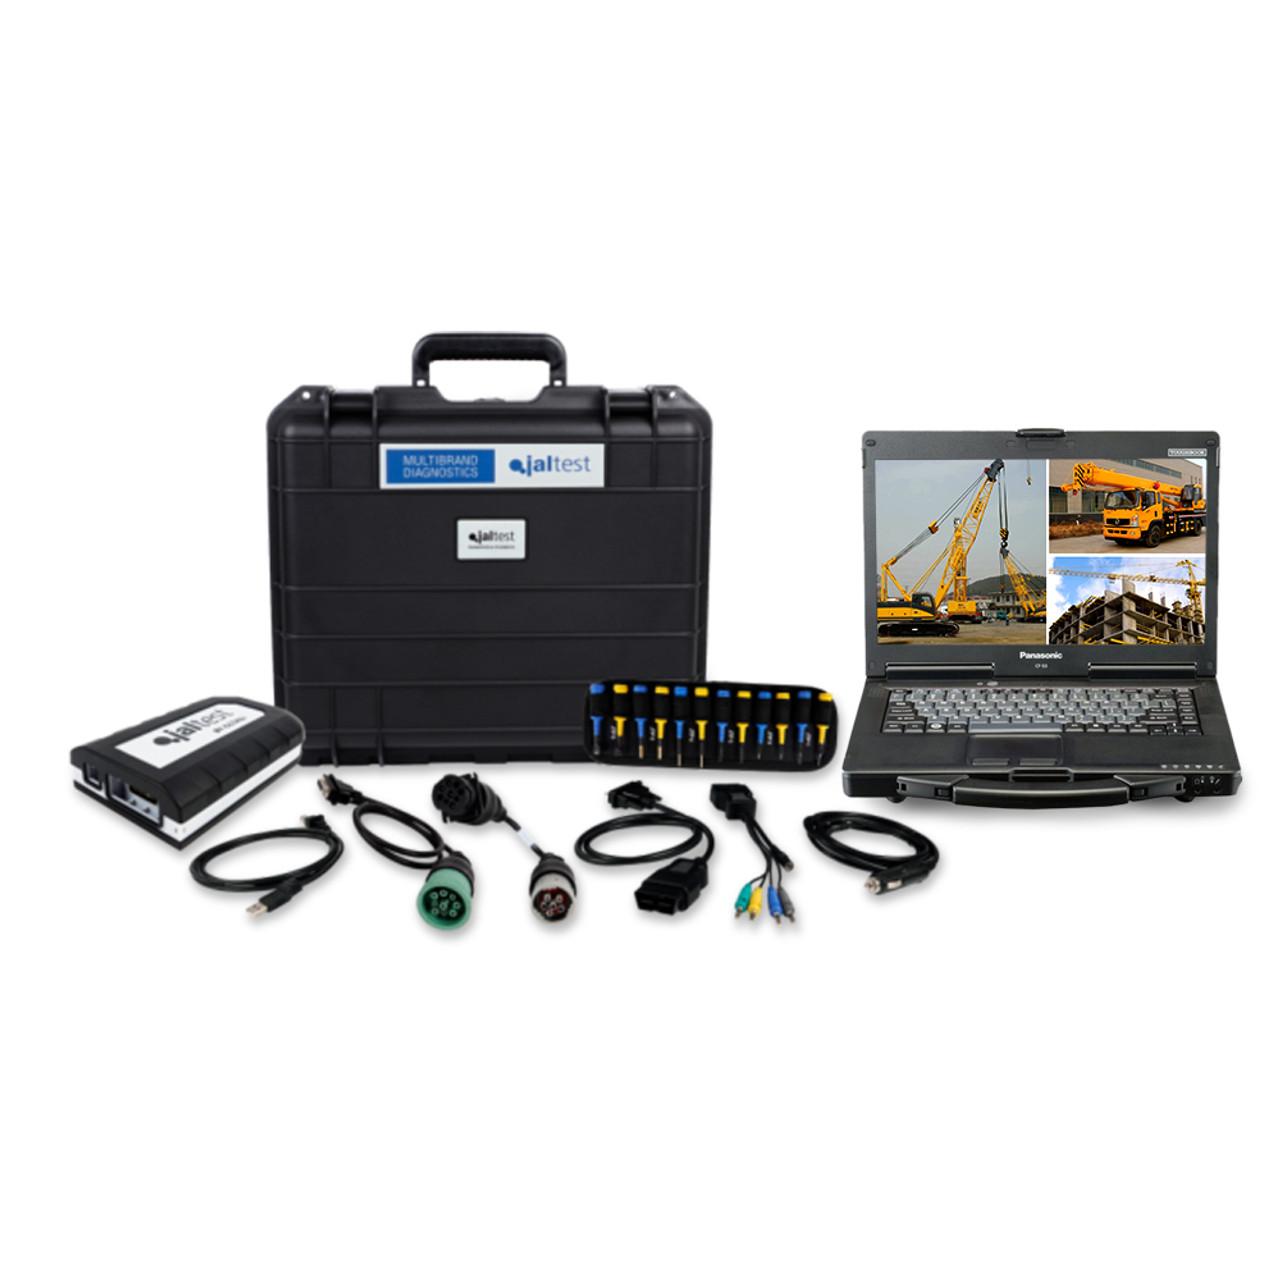 Crane Repair Diagnostic Jaltest Dealer Toughbook Laptop Kit